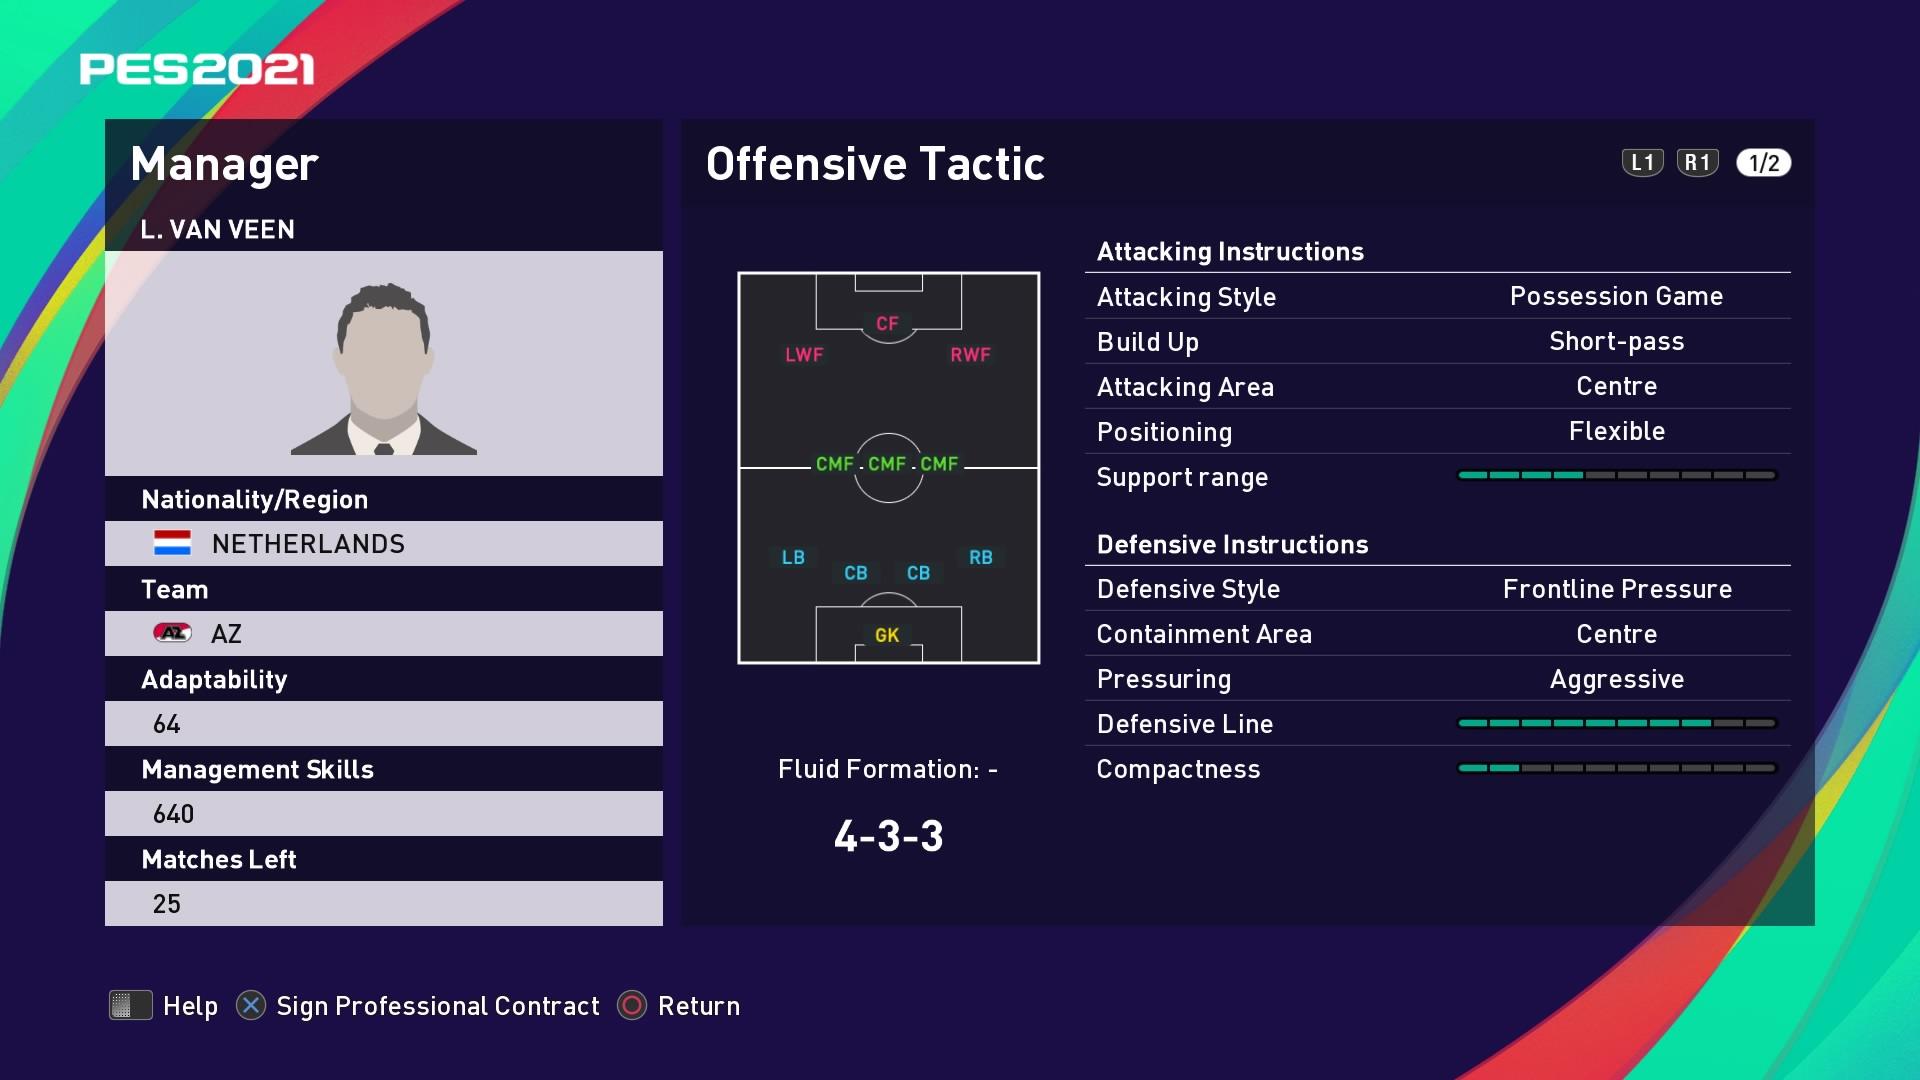 L. Van Veen (Arne Slot) Offensive Tactic in PES 2021 myClub